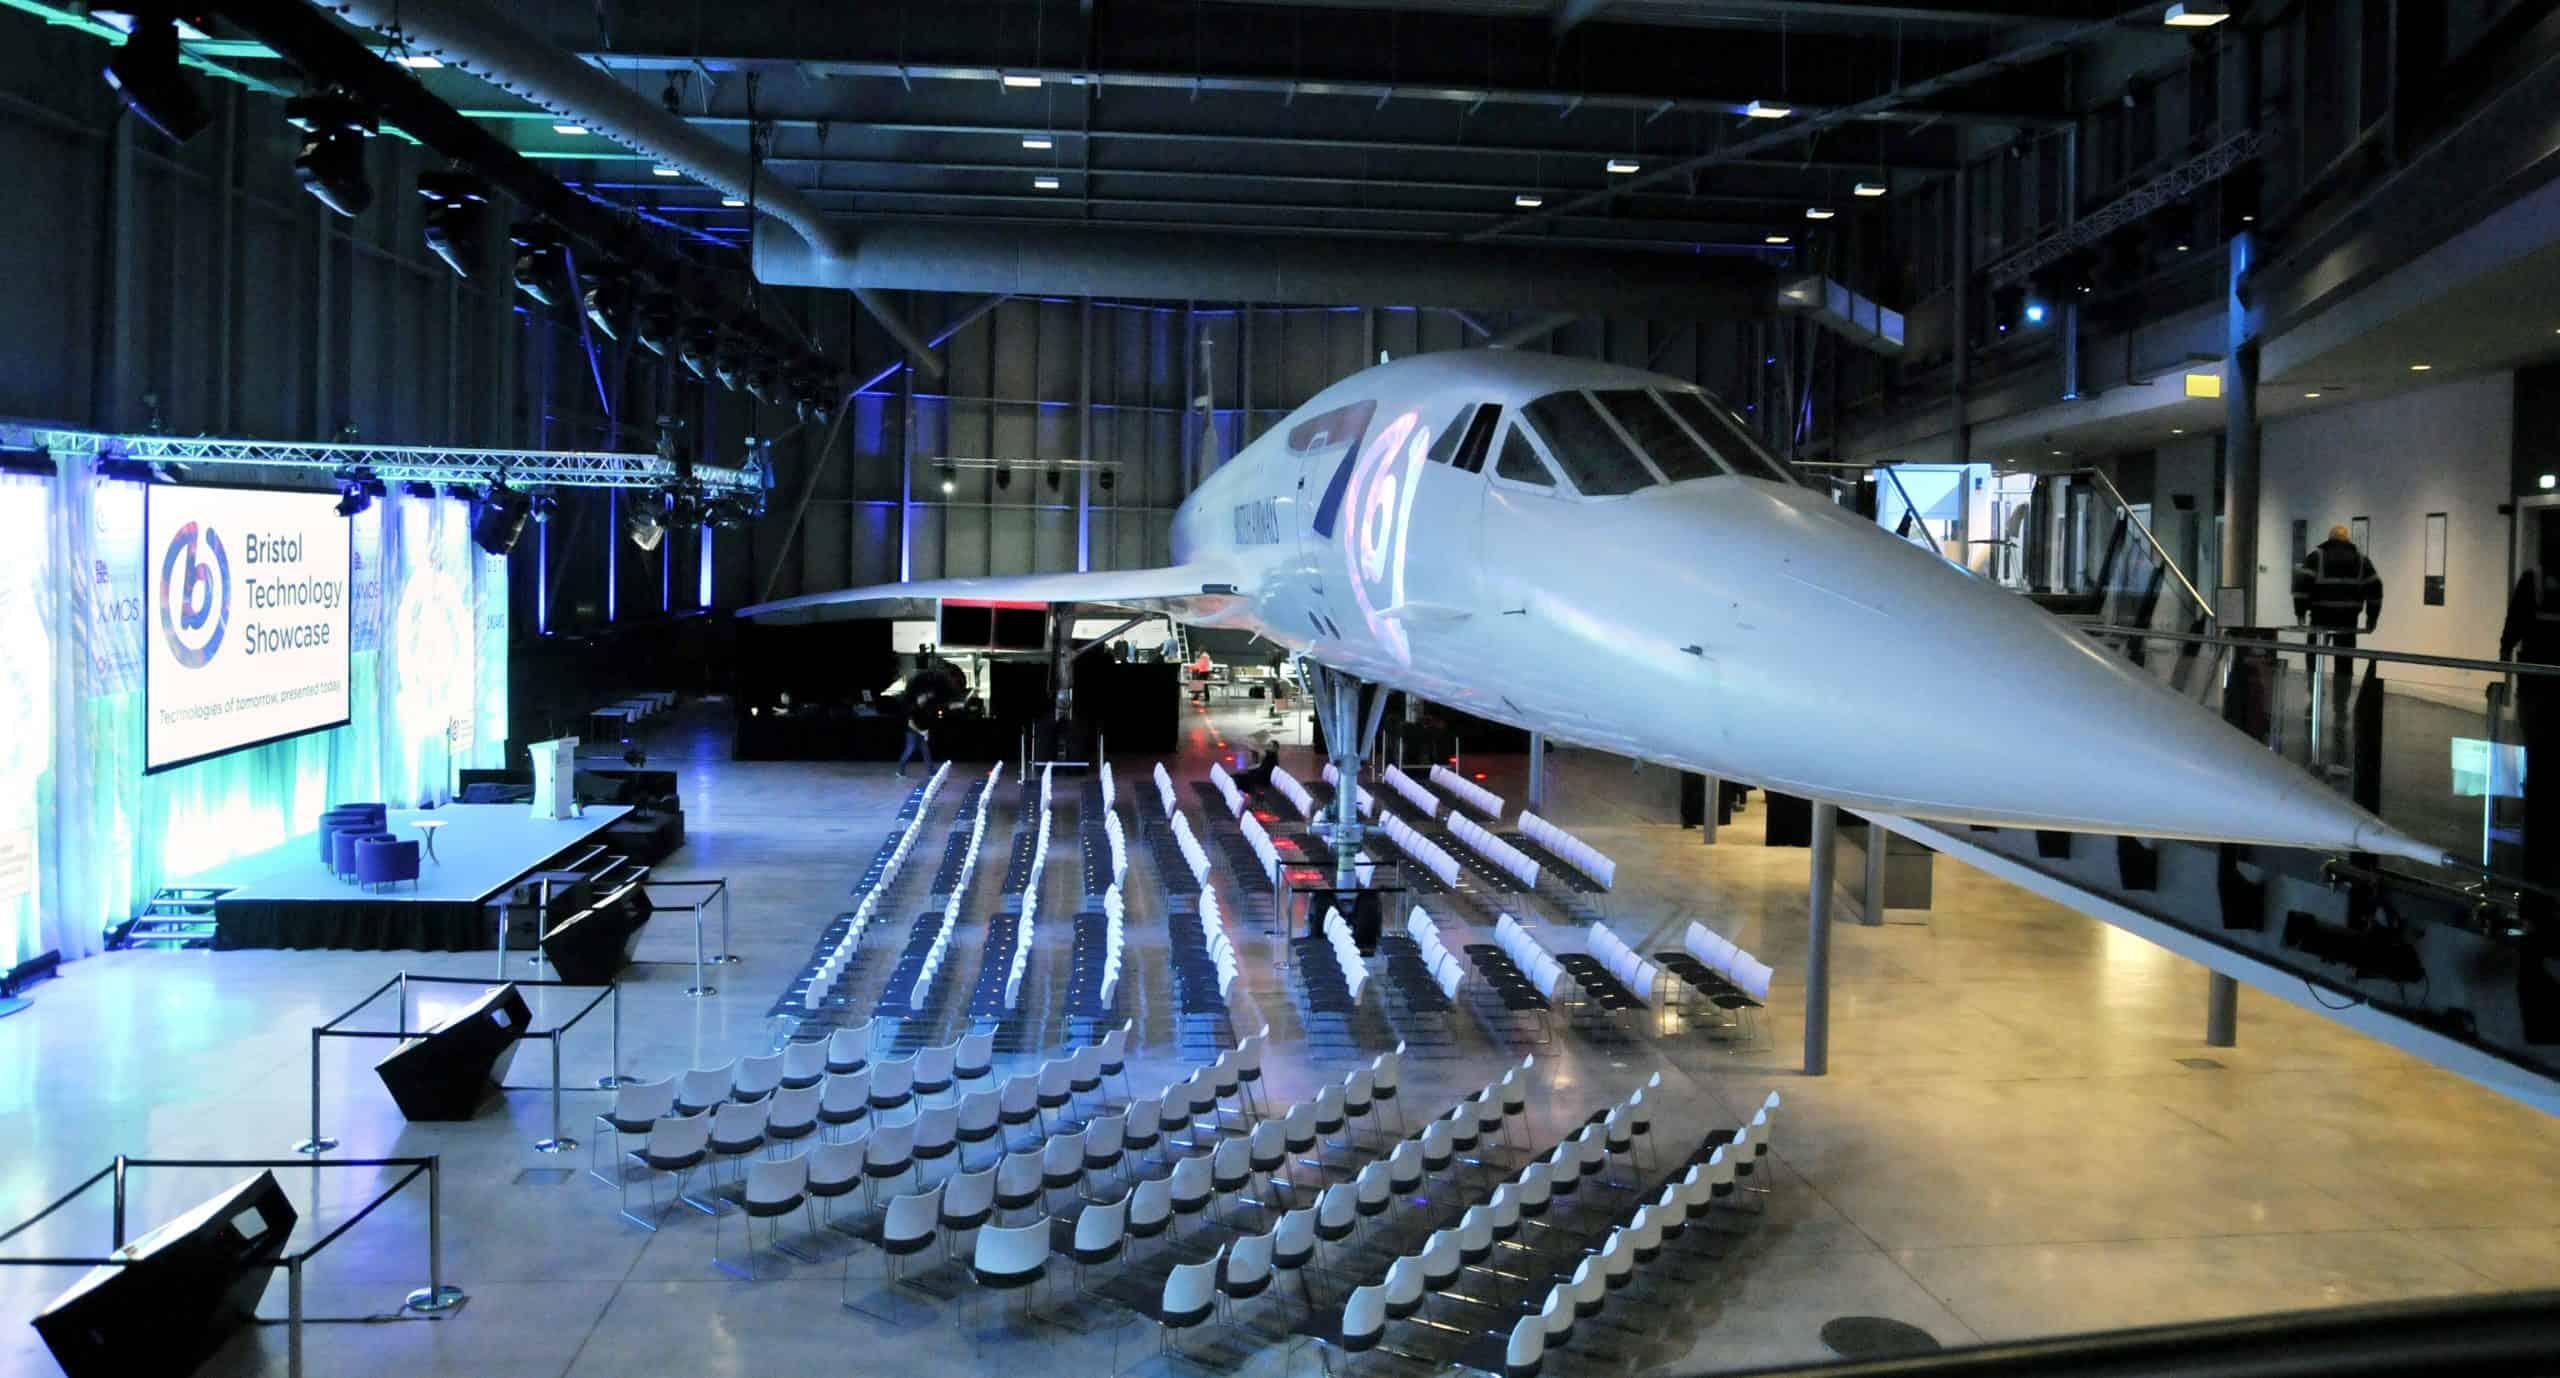 Bristol Technology Showcase